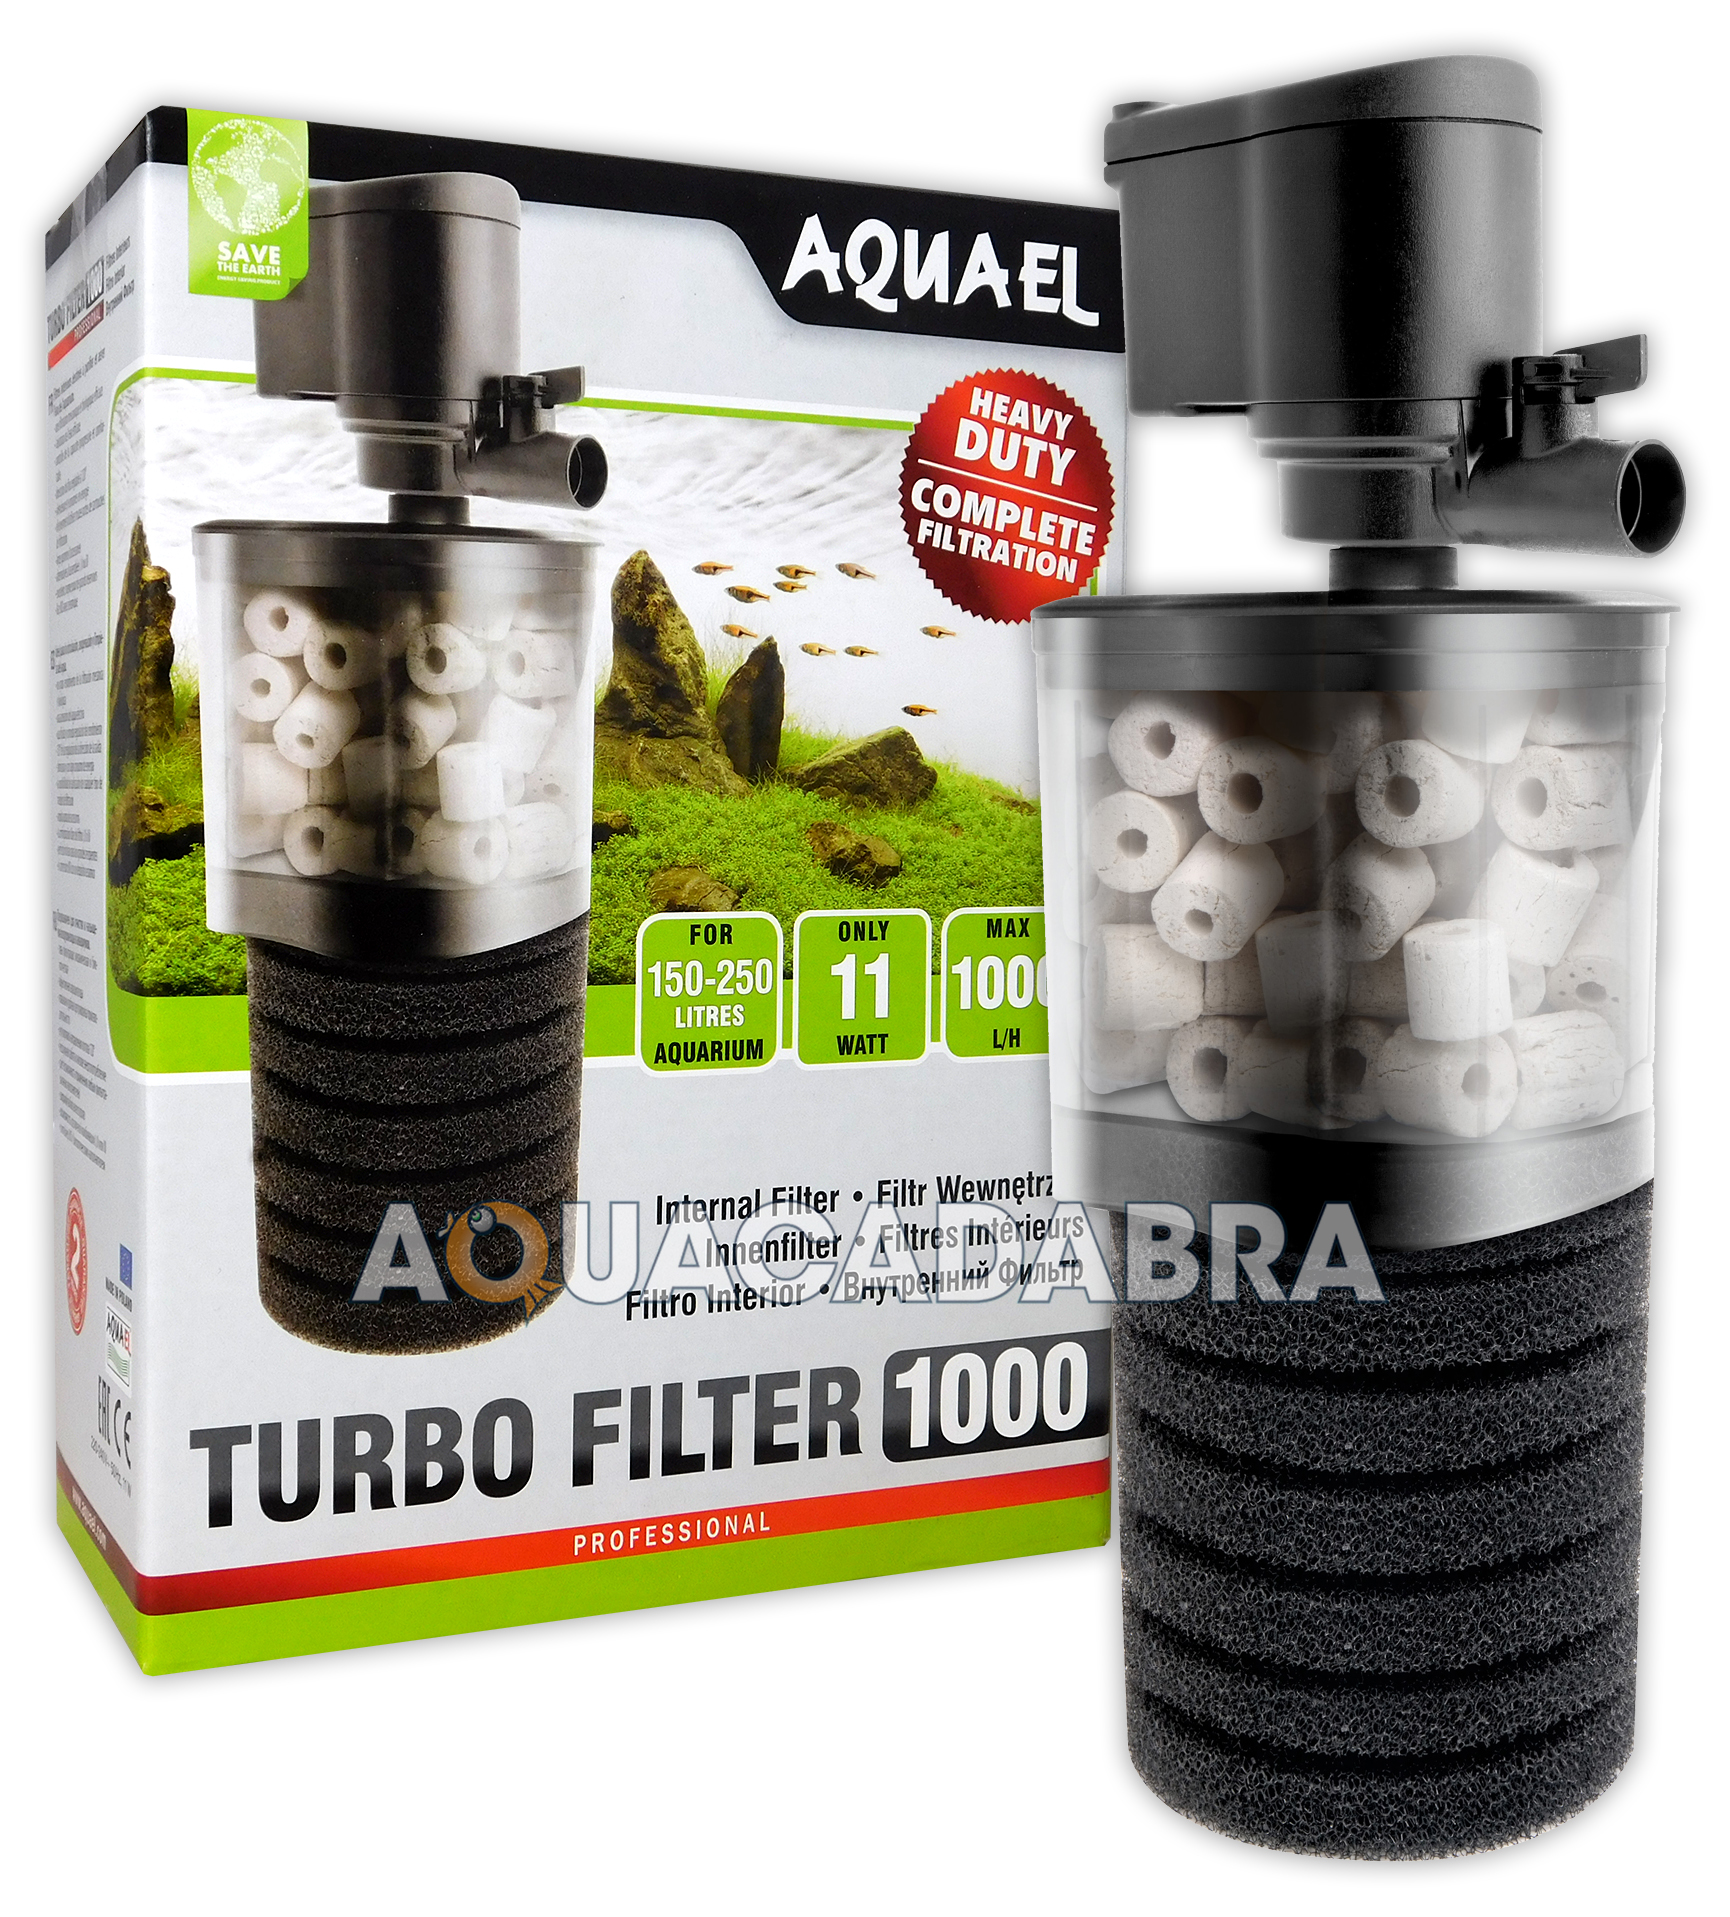 aquael turbo filters mechanical biological filtration aeration aquarium fish ebay. Black Bedroom Furniture Sets. Home Design Ideas